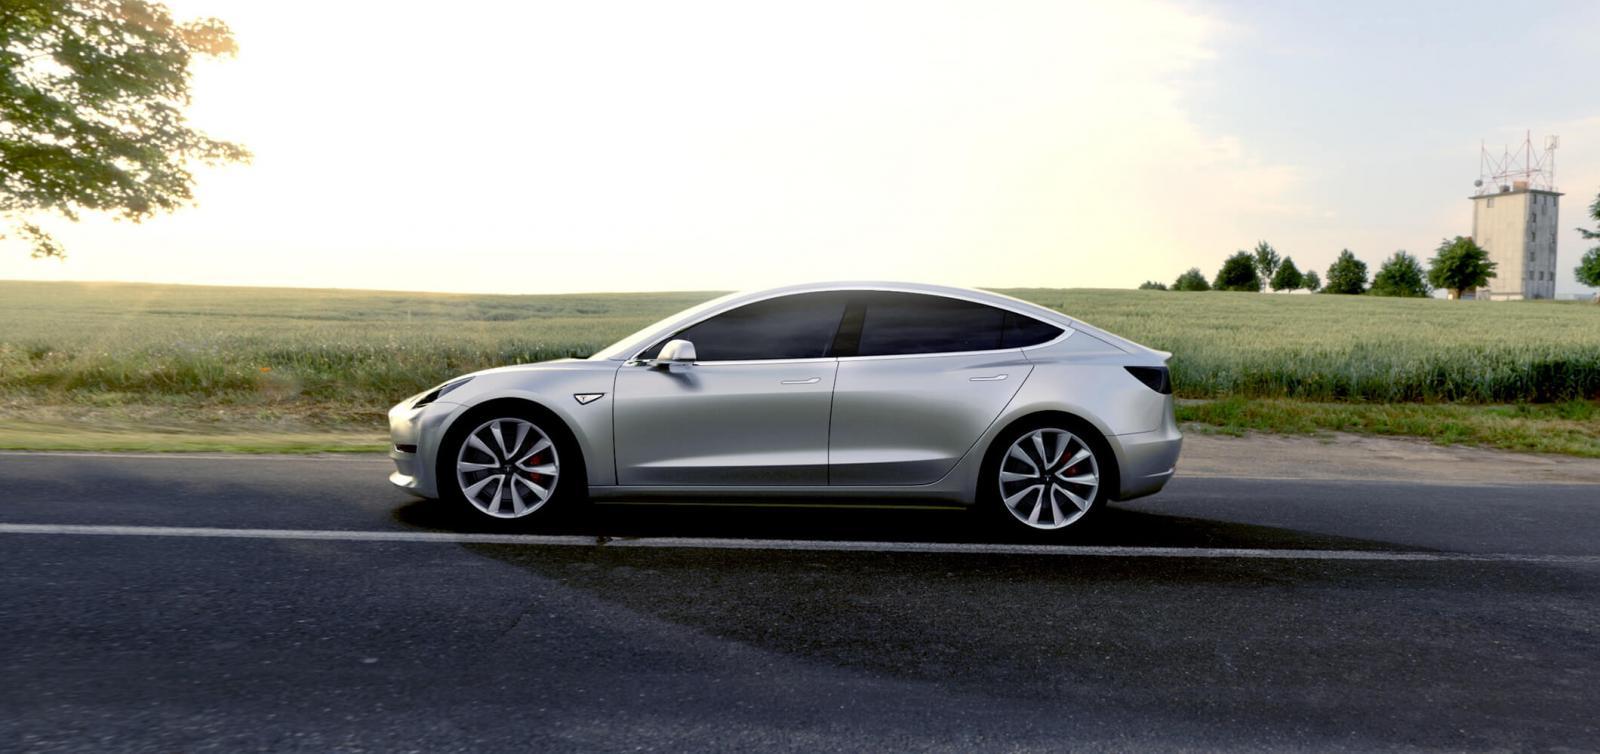 Tesla Model 3 publicity photo